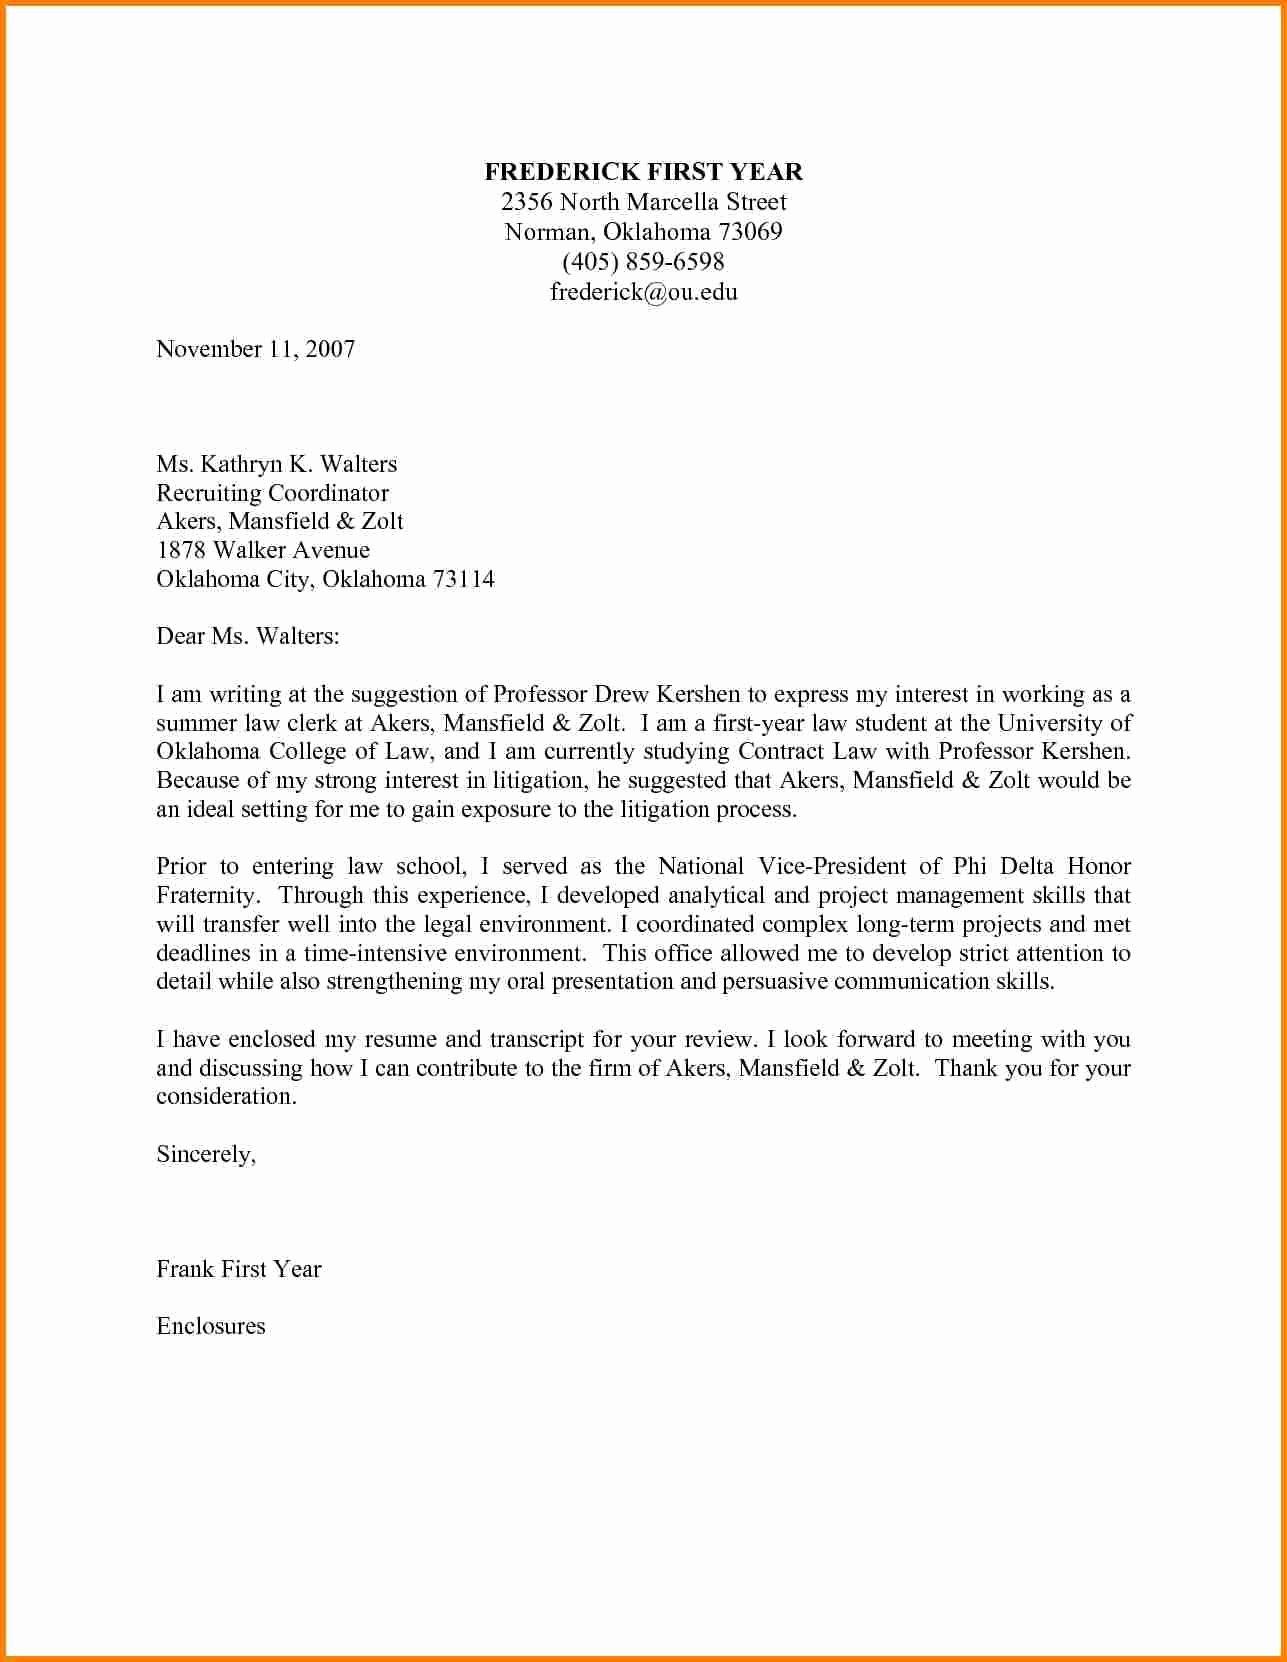 Cover Letter for Promotion Elegant Cover Letter for Promotion Sample Internal Position